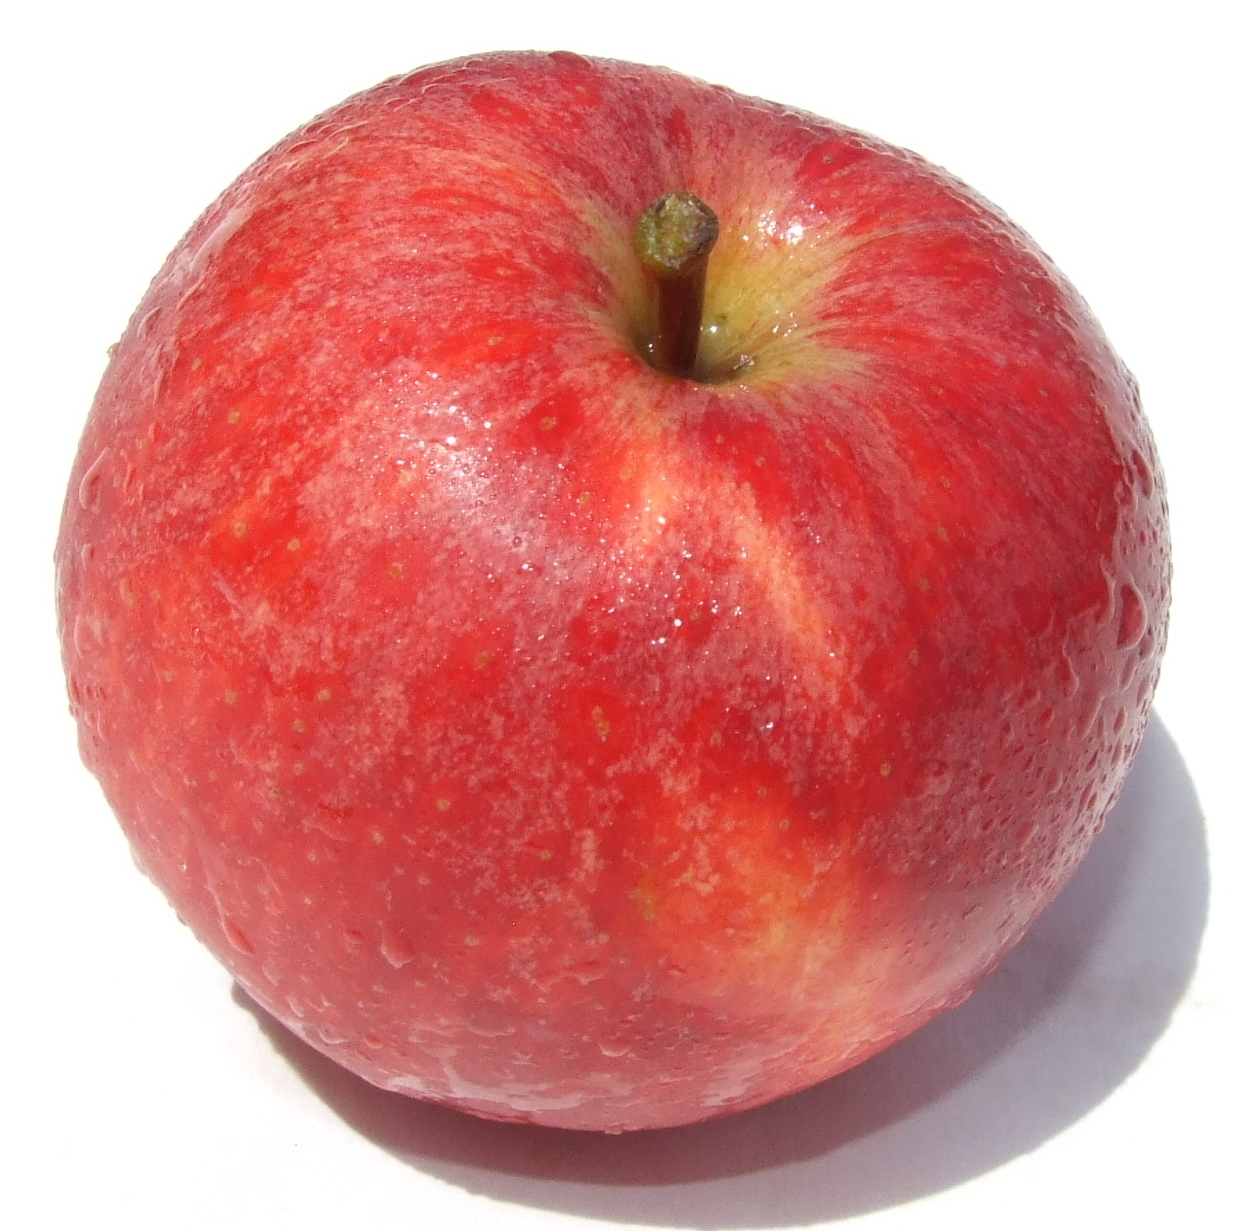 Apple - Royal Gala